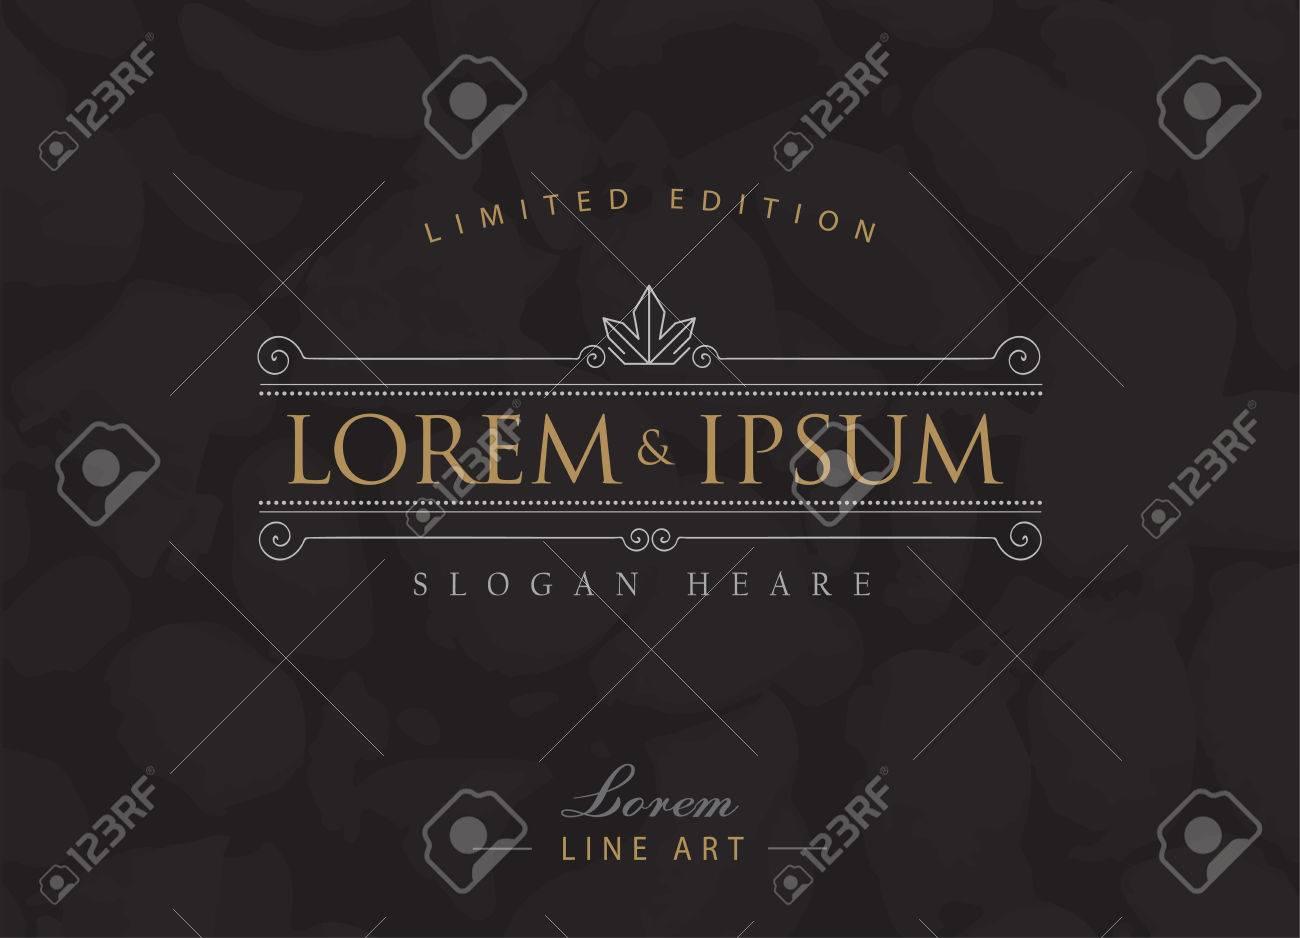 Luxury Logos Flourishes Calligraphy Elegant Template Royalty Free ...